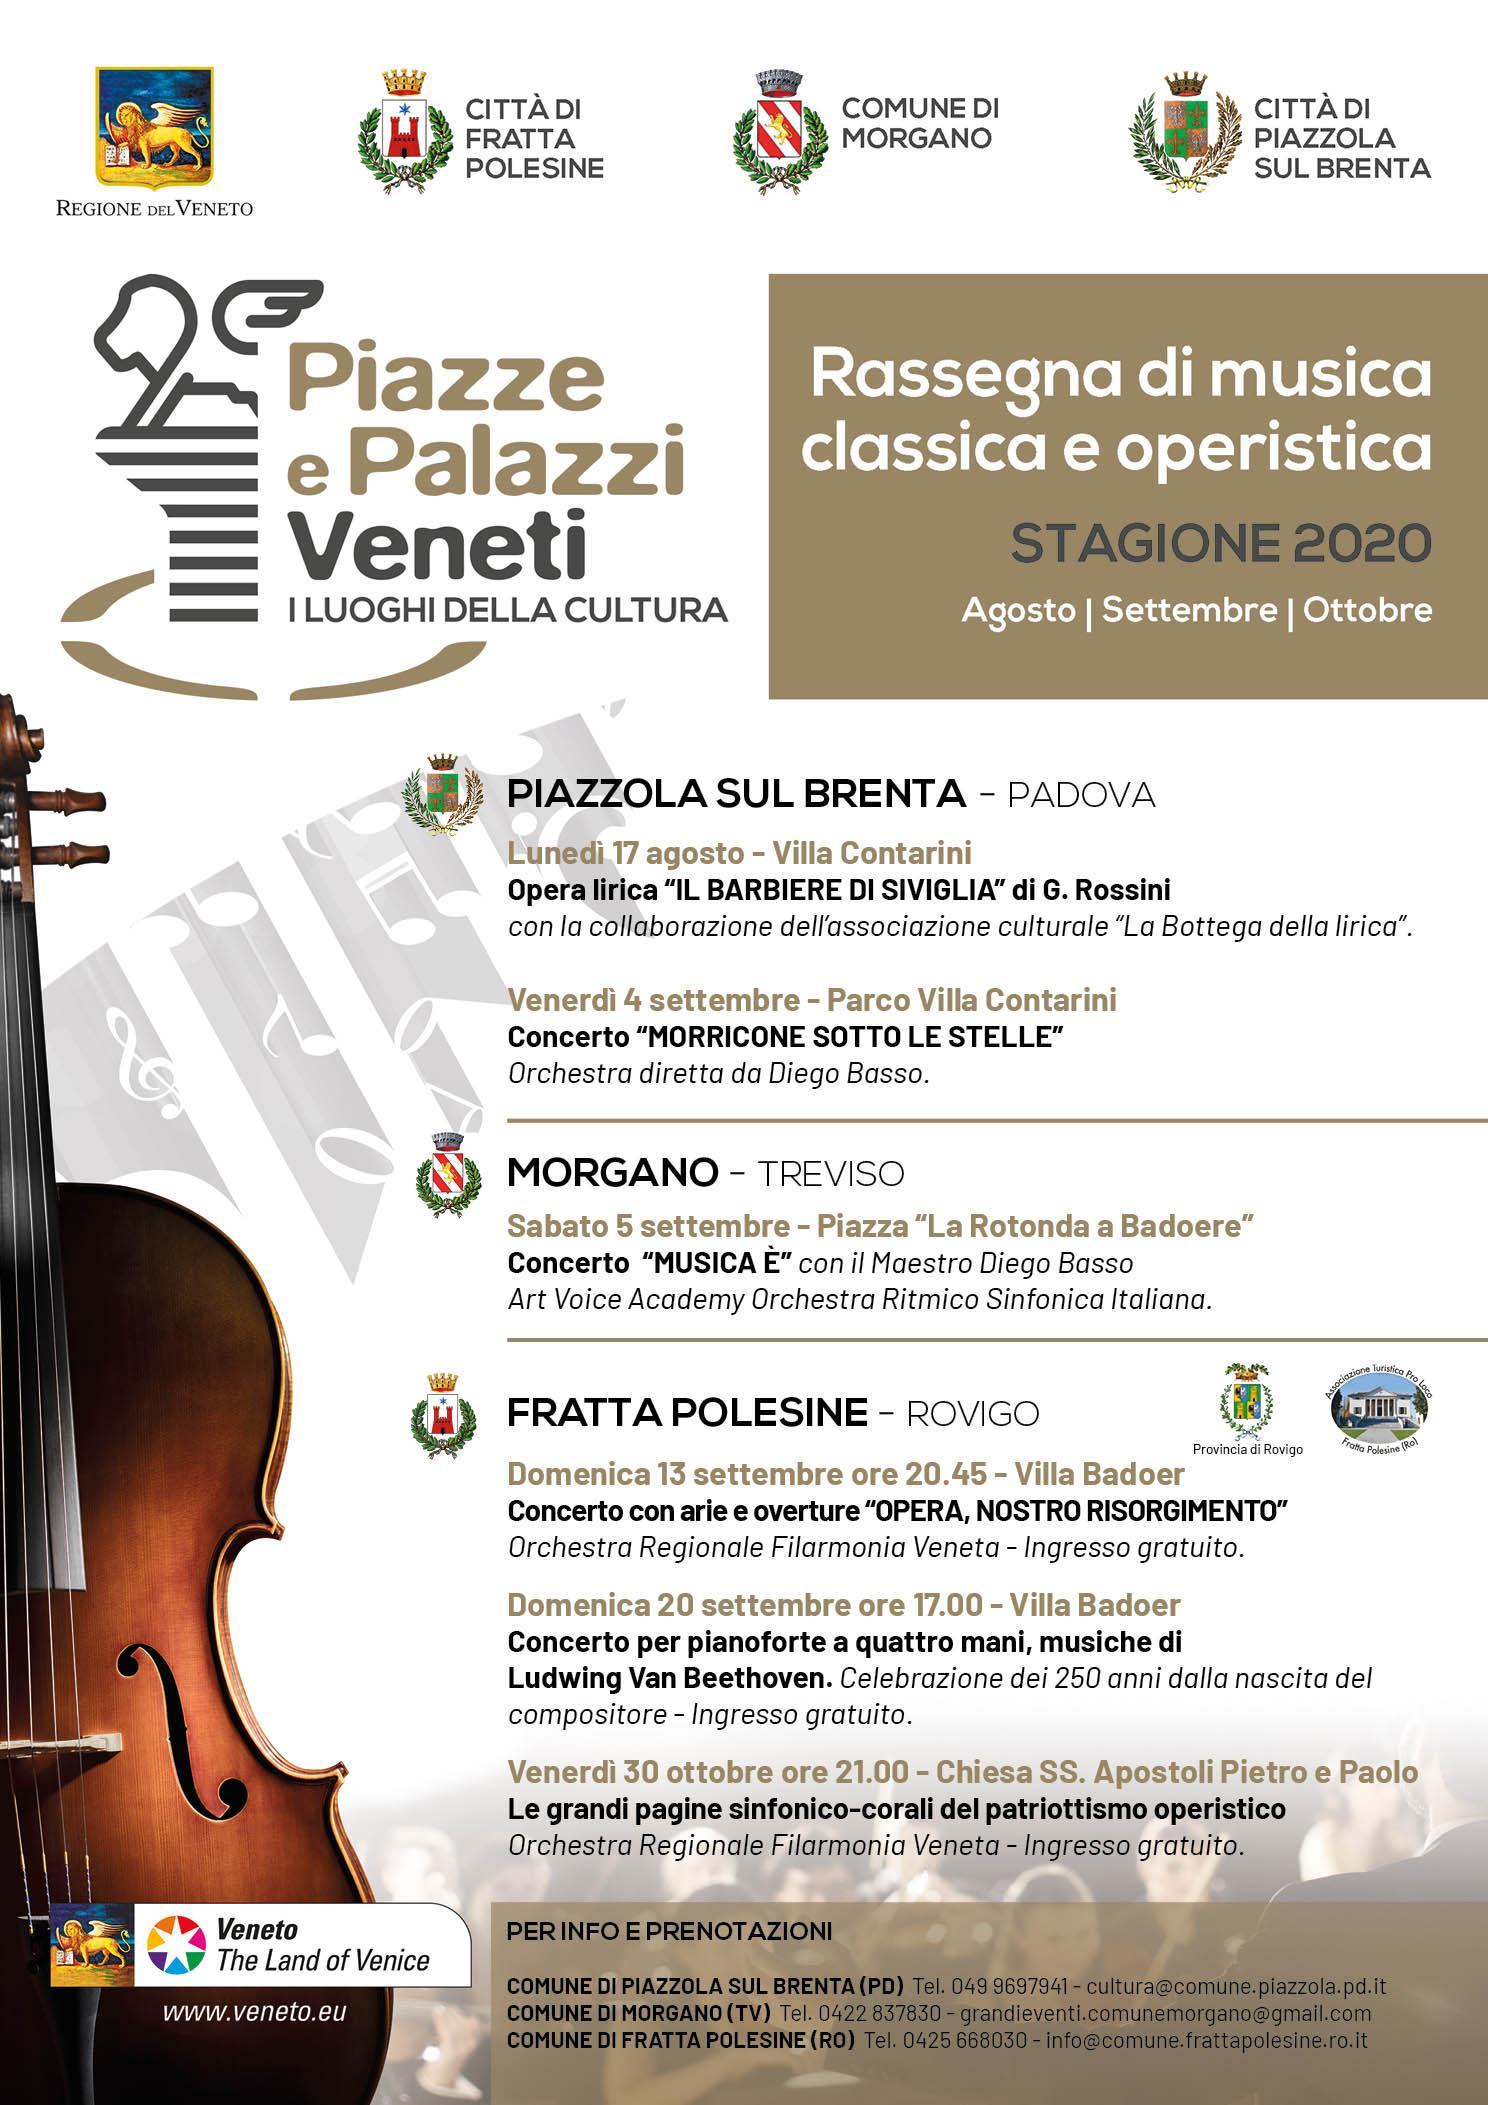 Rassegna di musica classica e operistica stagione 2020